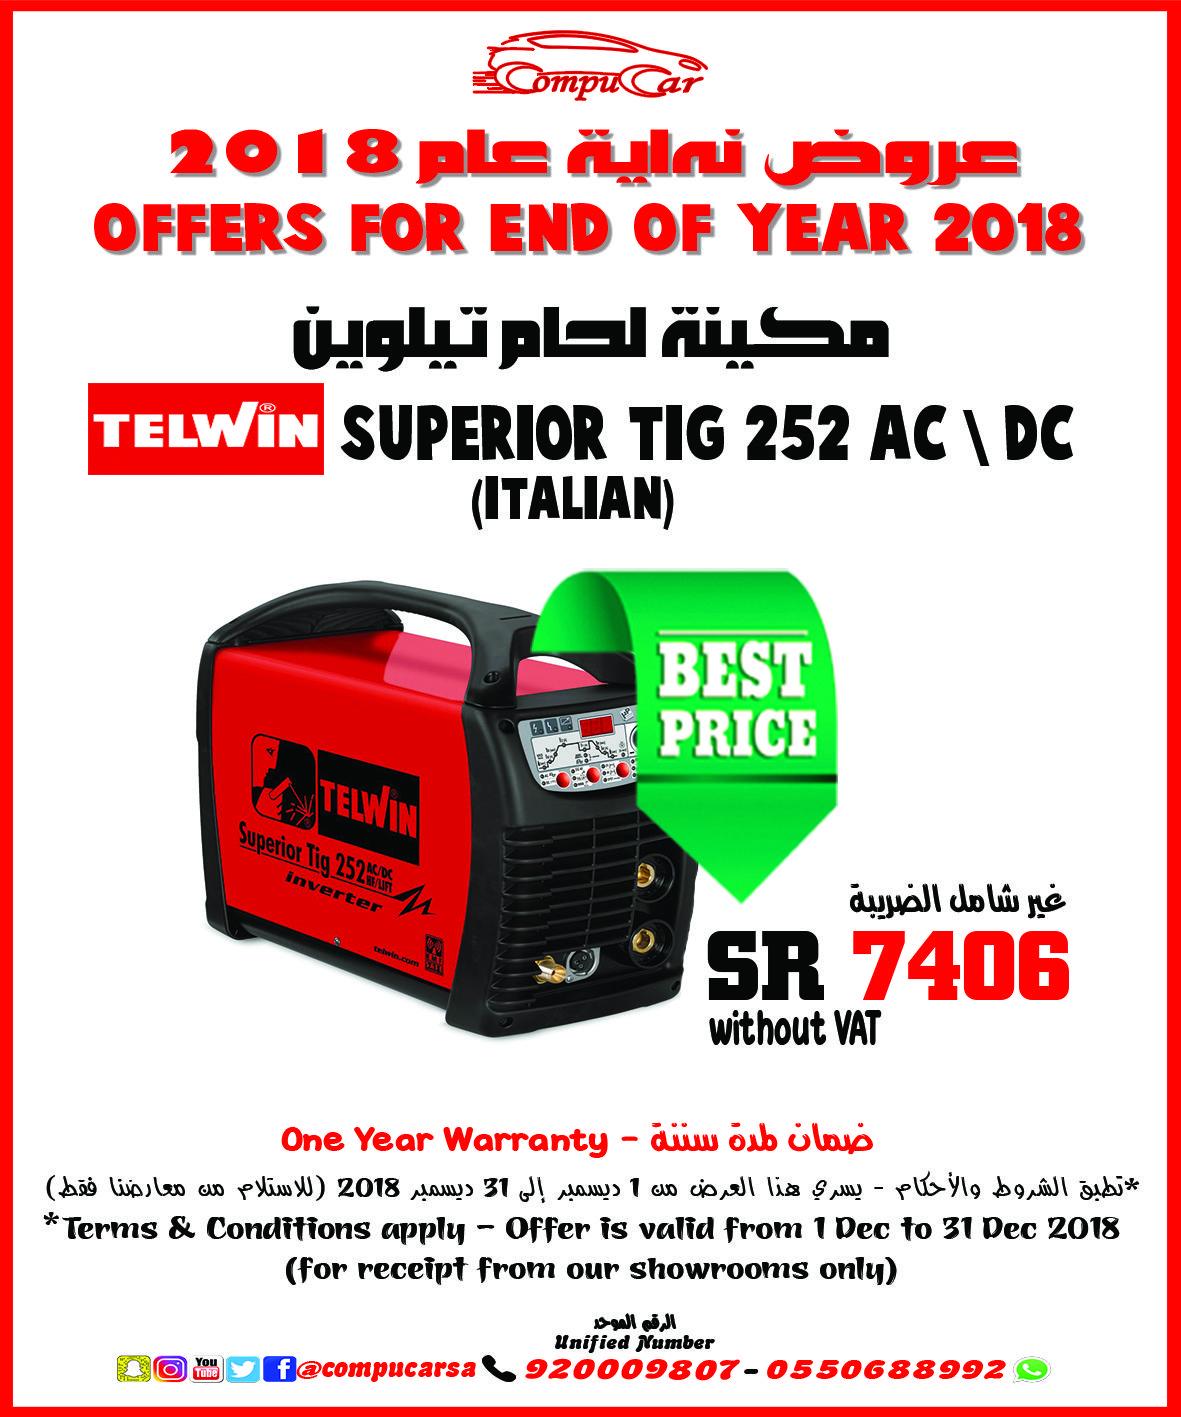 مكينة لحام تيلوين Telwin Superior Tig 252 AC \ DC (Italian